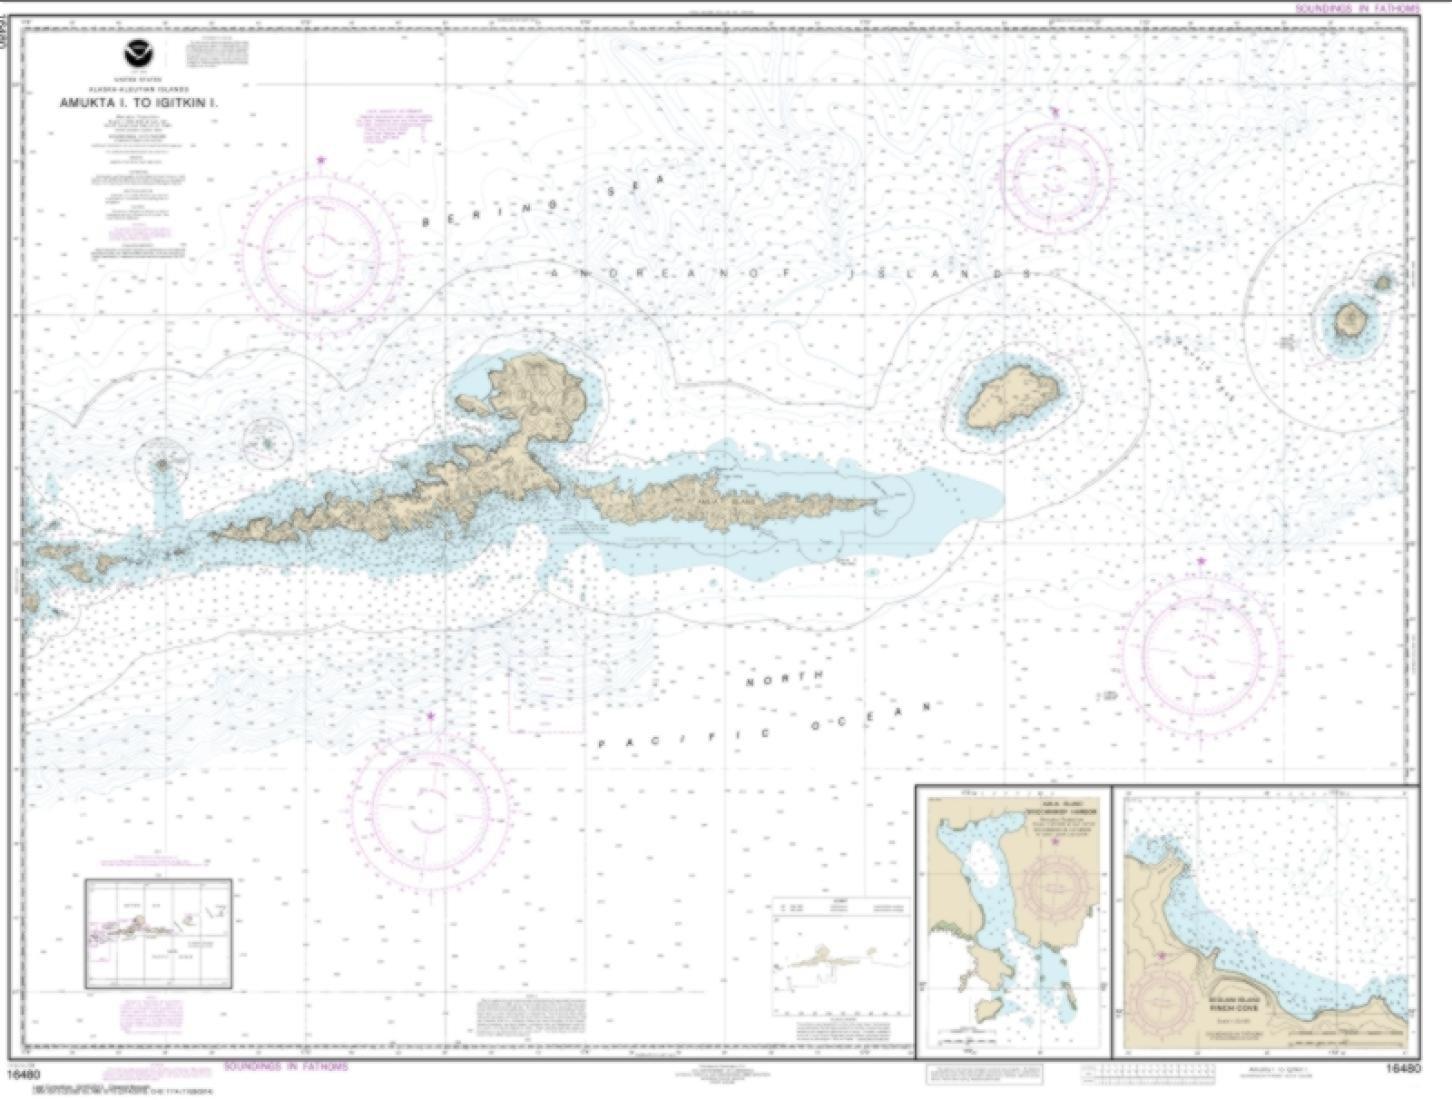 NOAA Chart 16480-Amkta Island to Igitkin Island; Finch Cove Seguam Island; Sviechnikof Harbor, Amilia Island